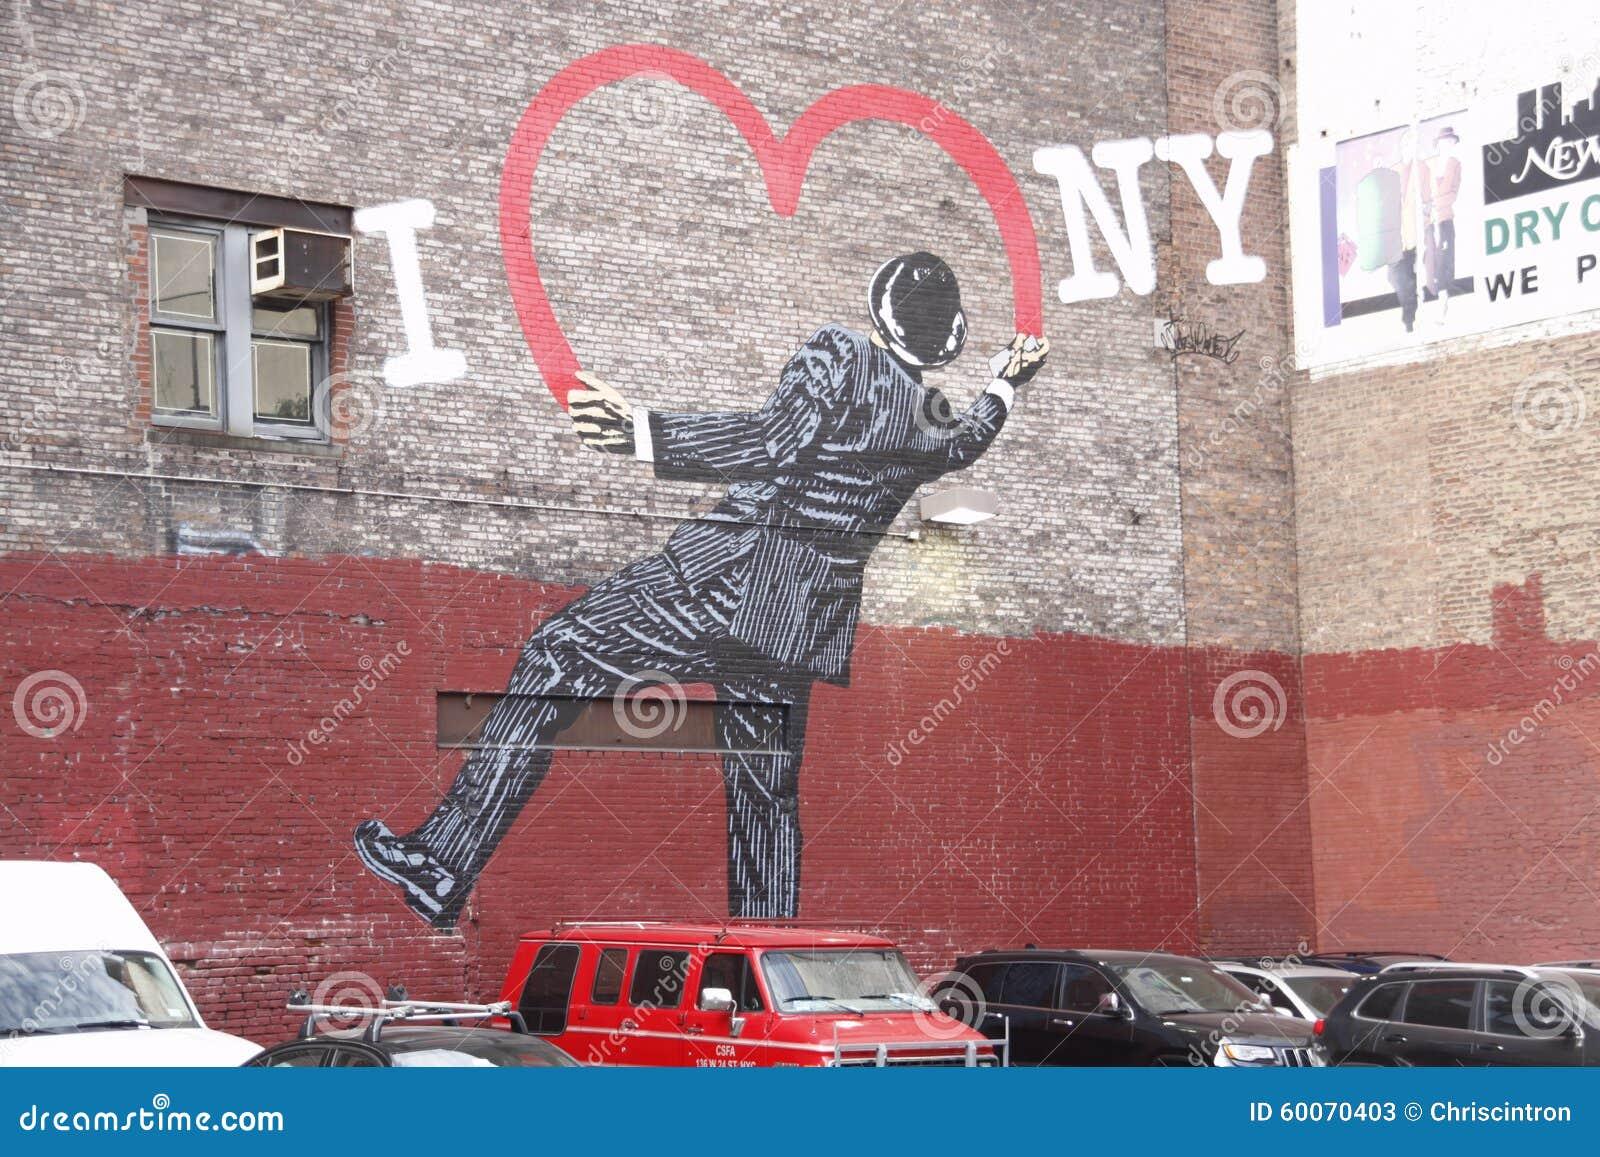 street art i heart new york editorial stock photo image. Black Bedroom Furniture Sets. Home Design Ideas